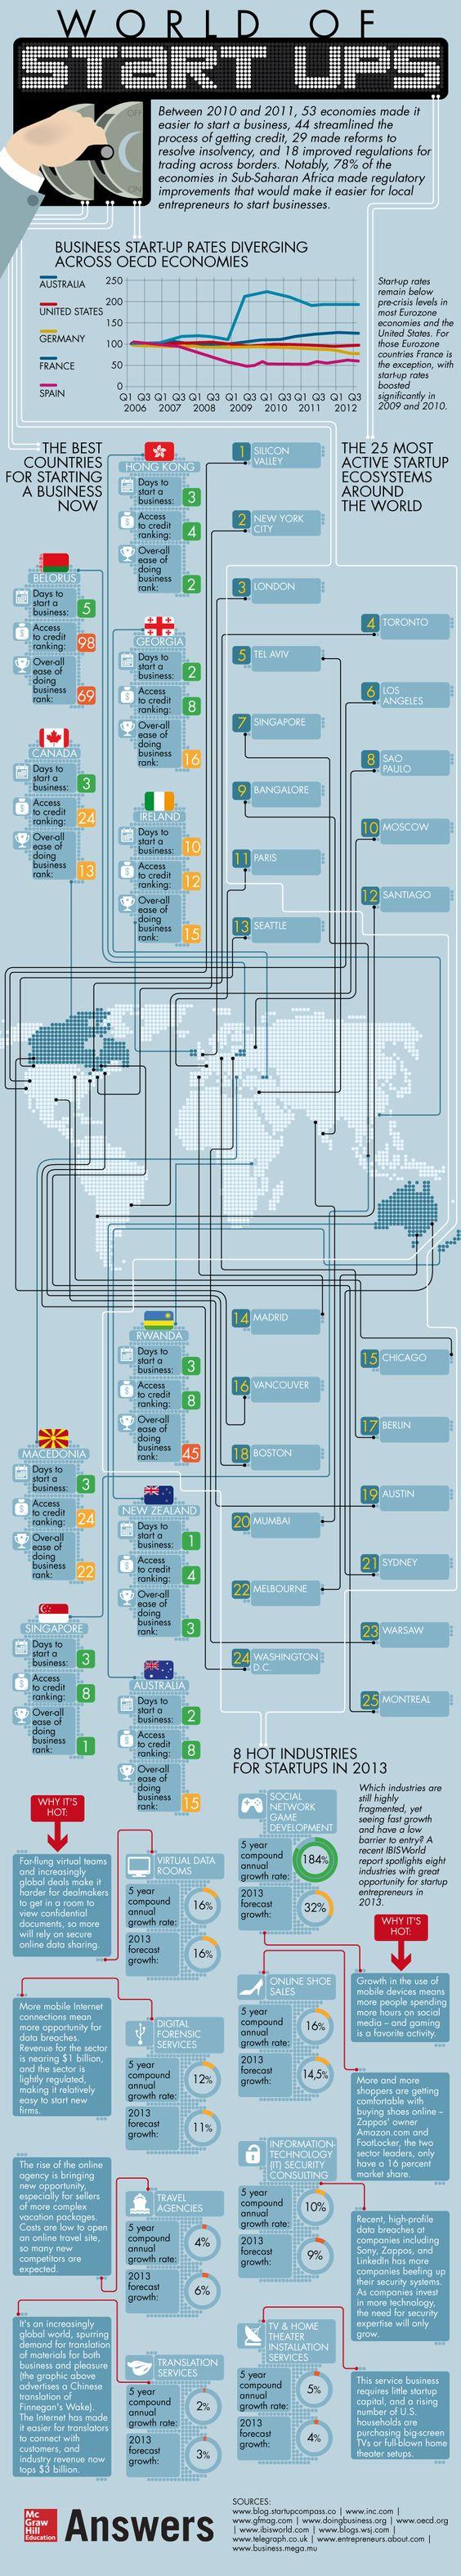 World of Start Ups #infographic #albertobokos